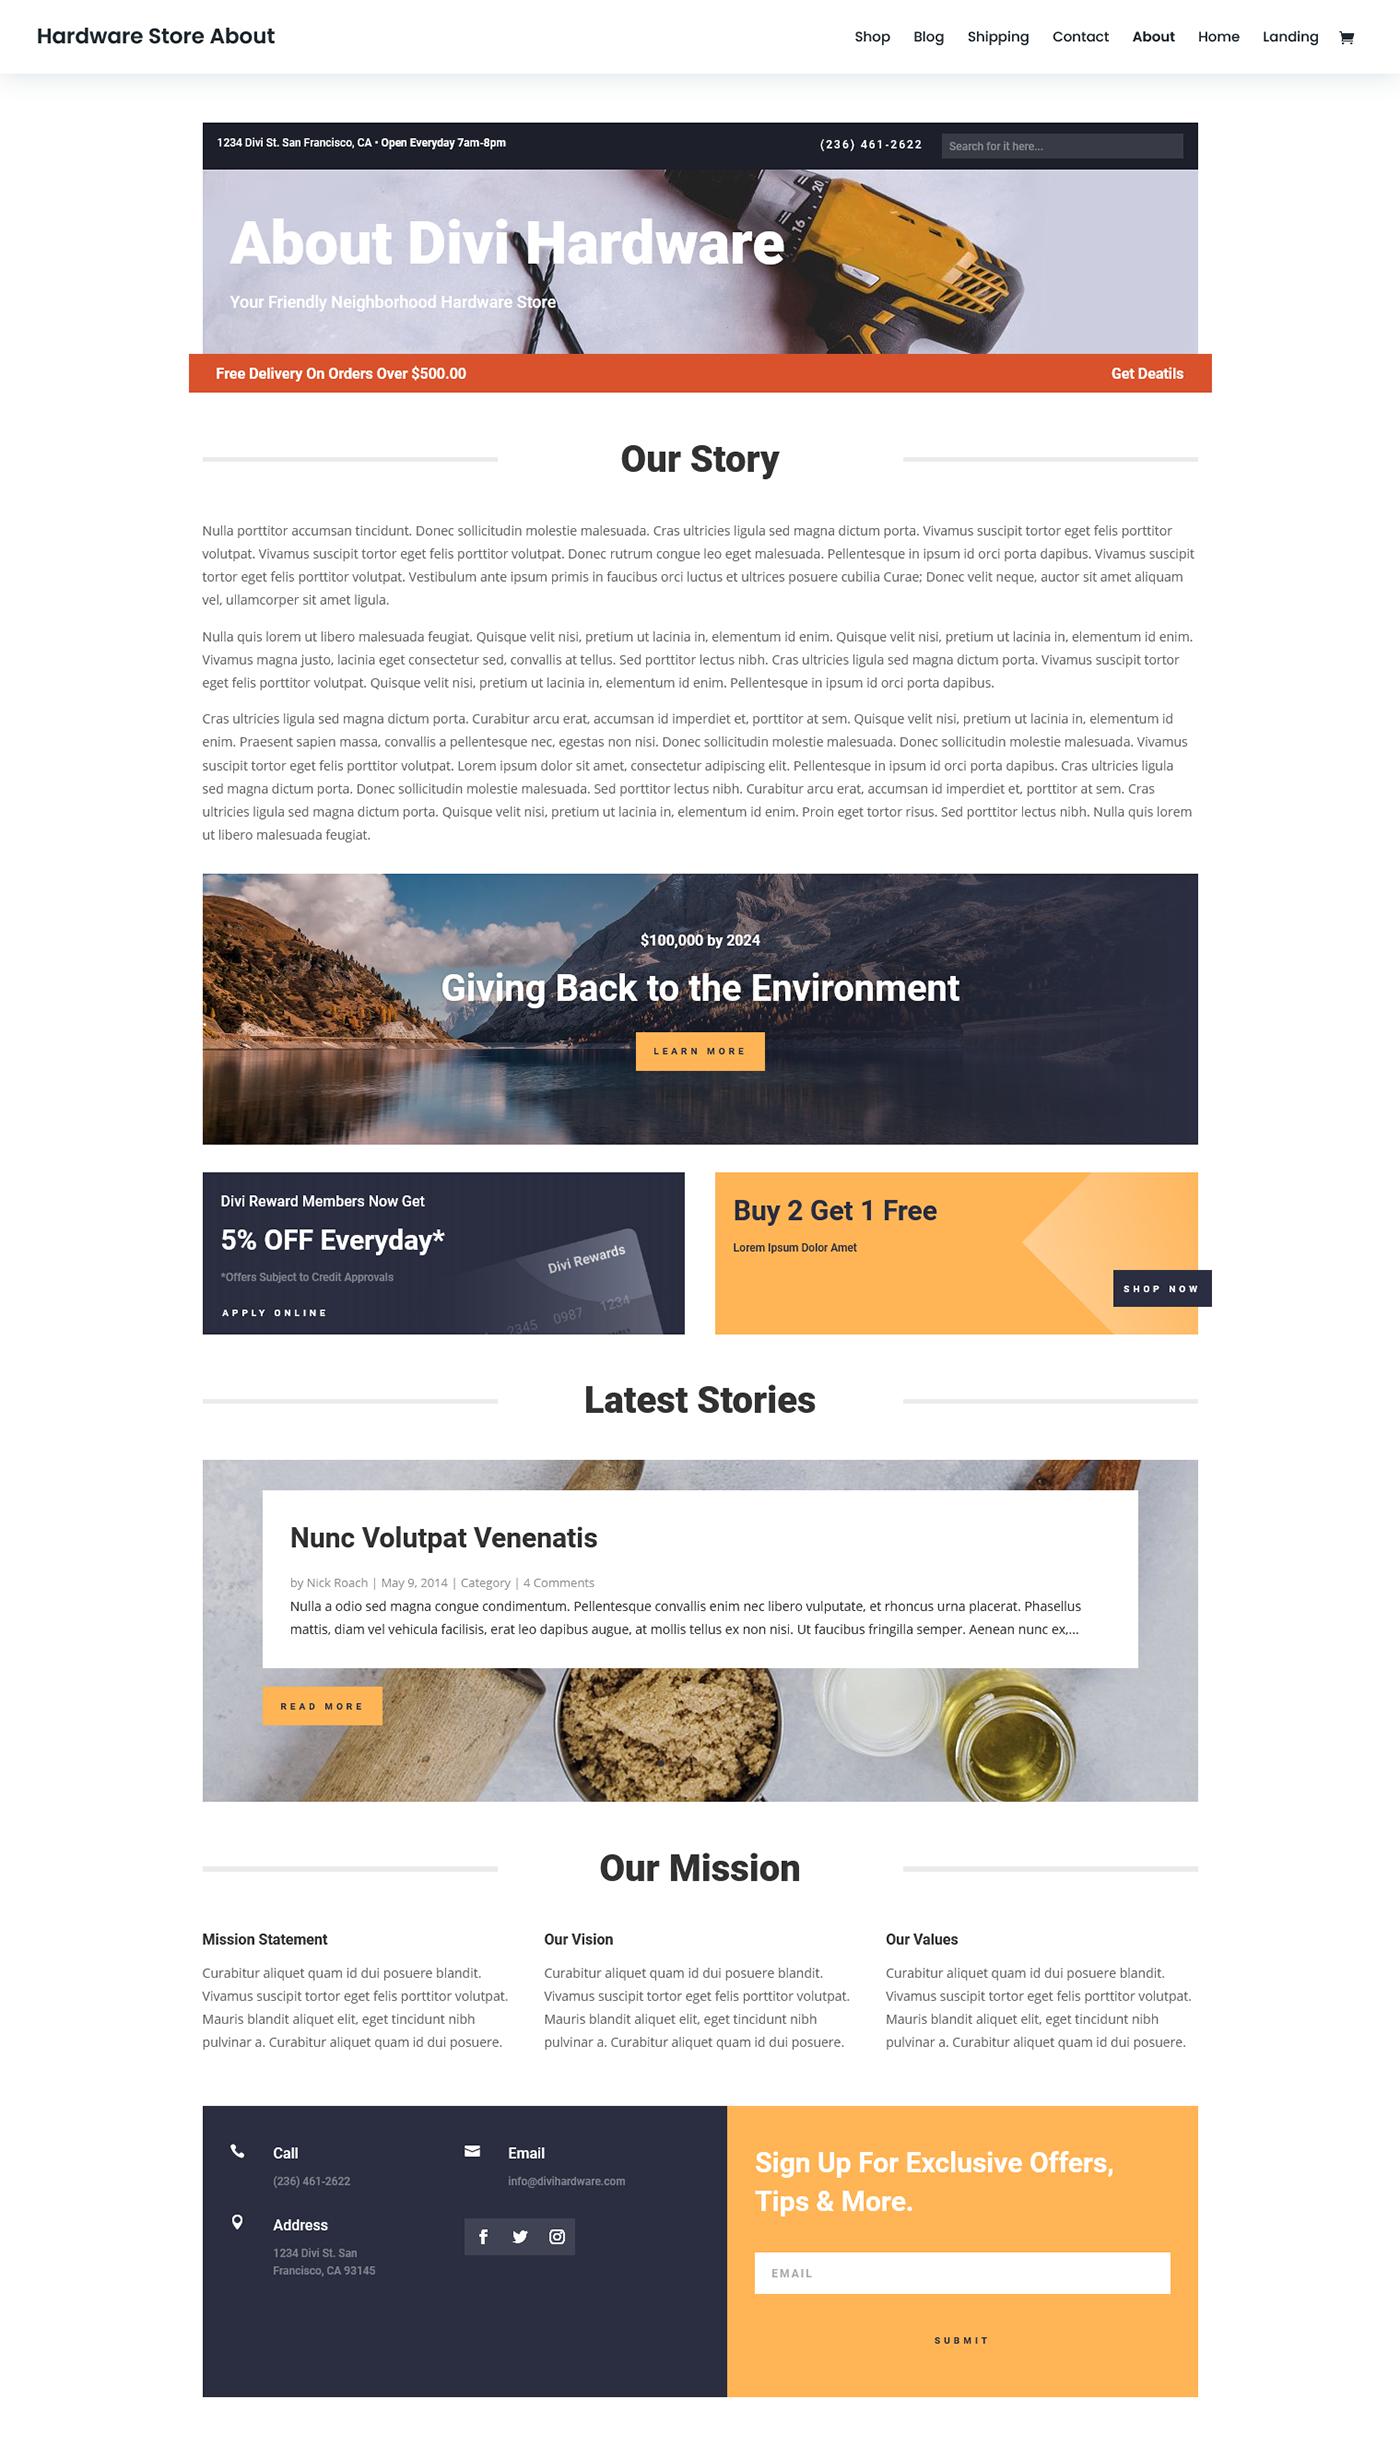 hardware company website hardware shop web development  Website Design website development zaman ador